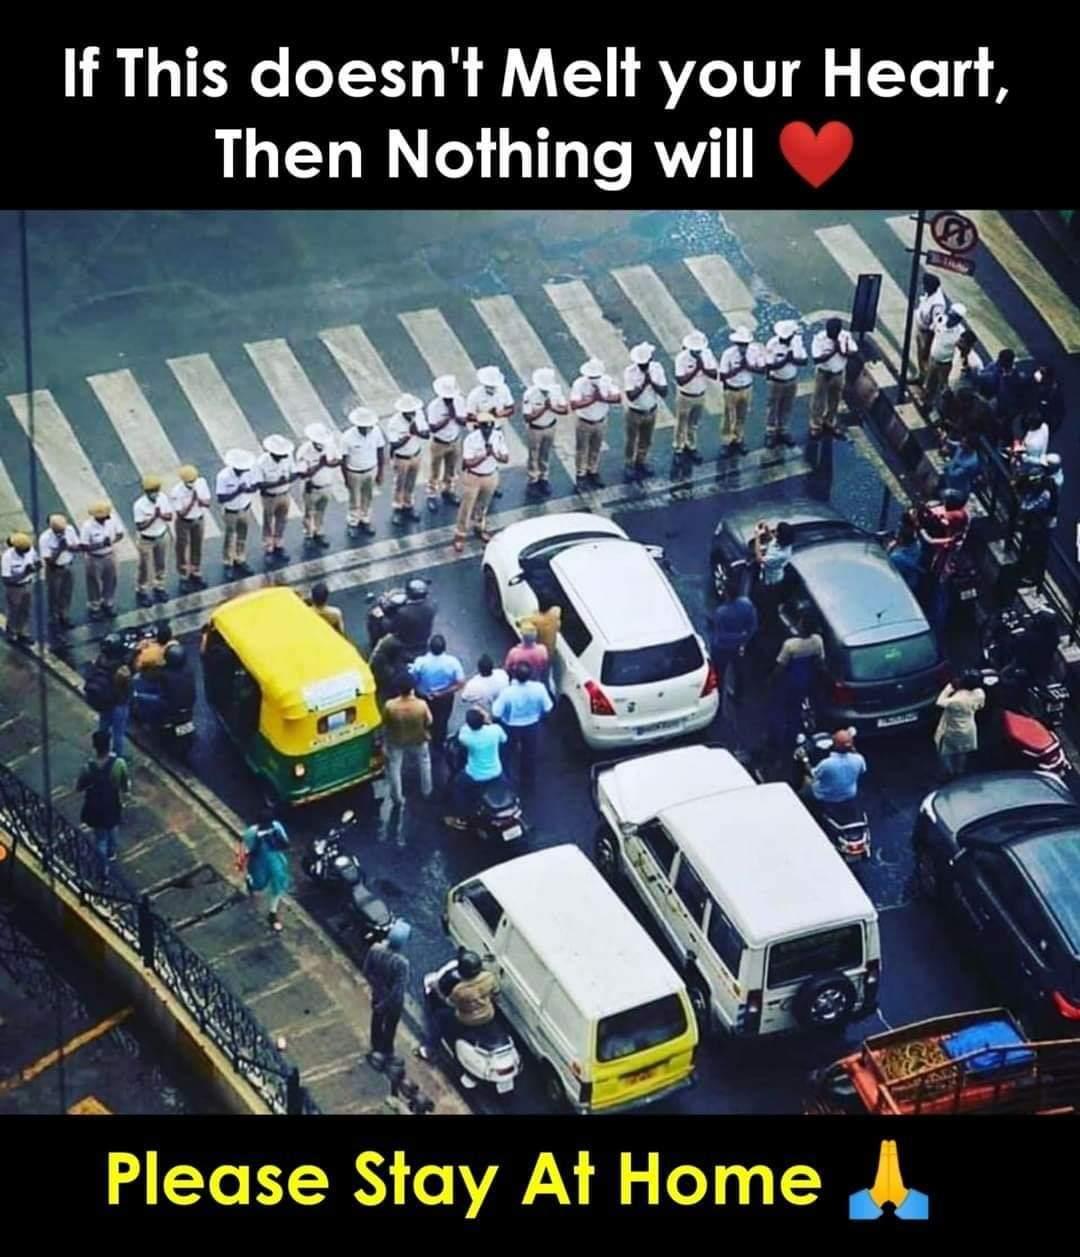 In Photos: #Carona Times in India #Lockdown